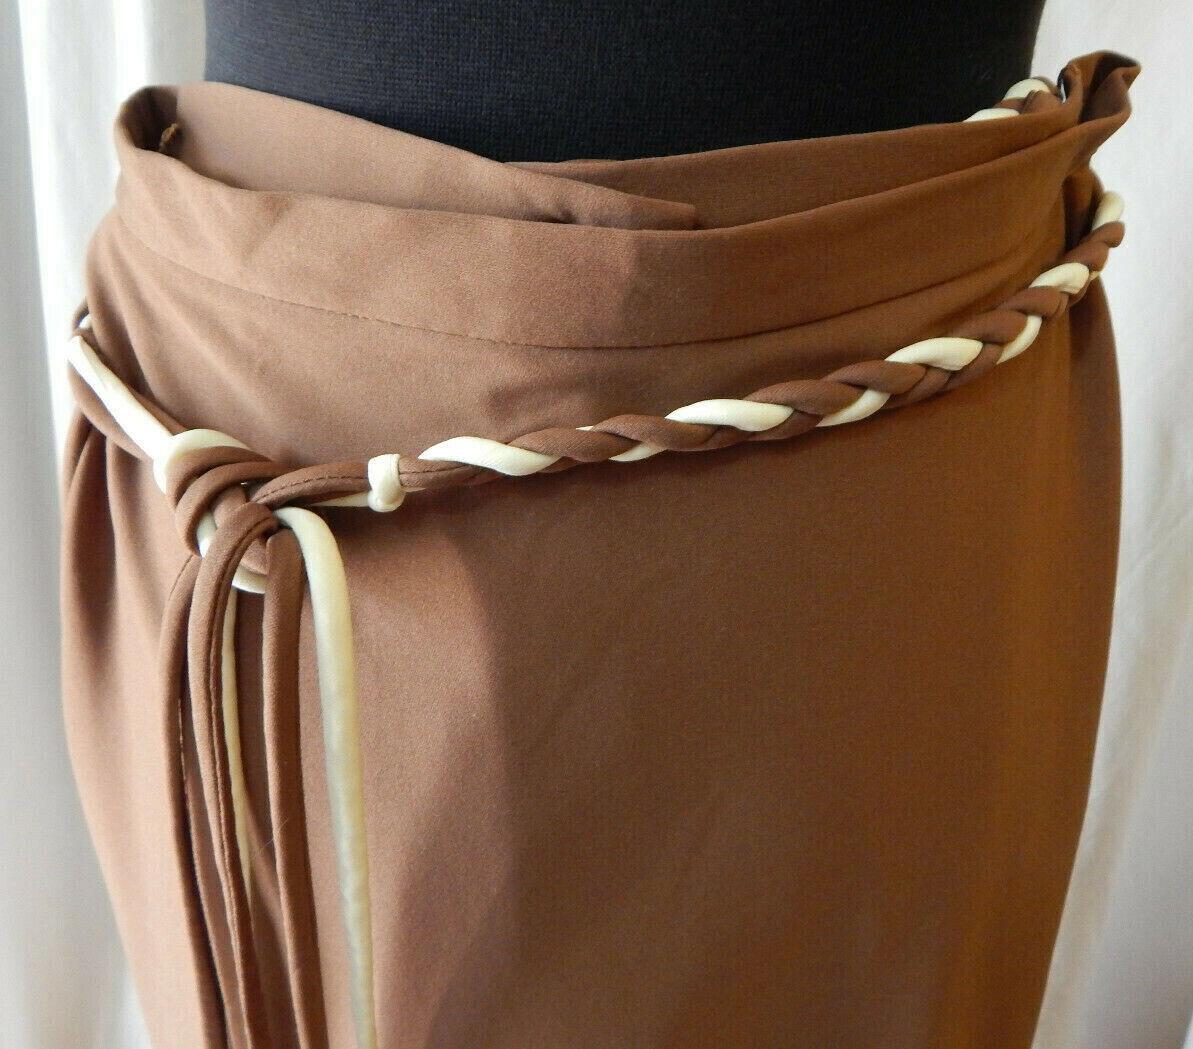 Vintage Miss Shaheen Skirt - image 3